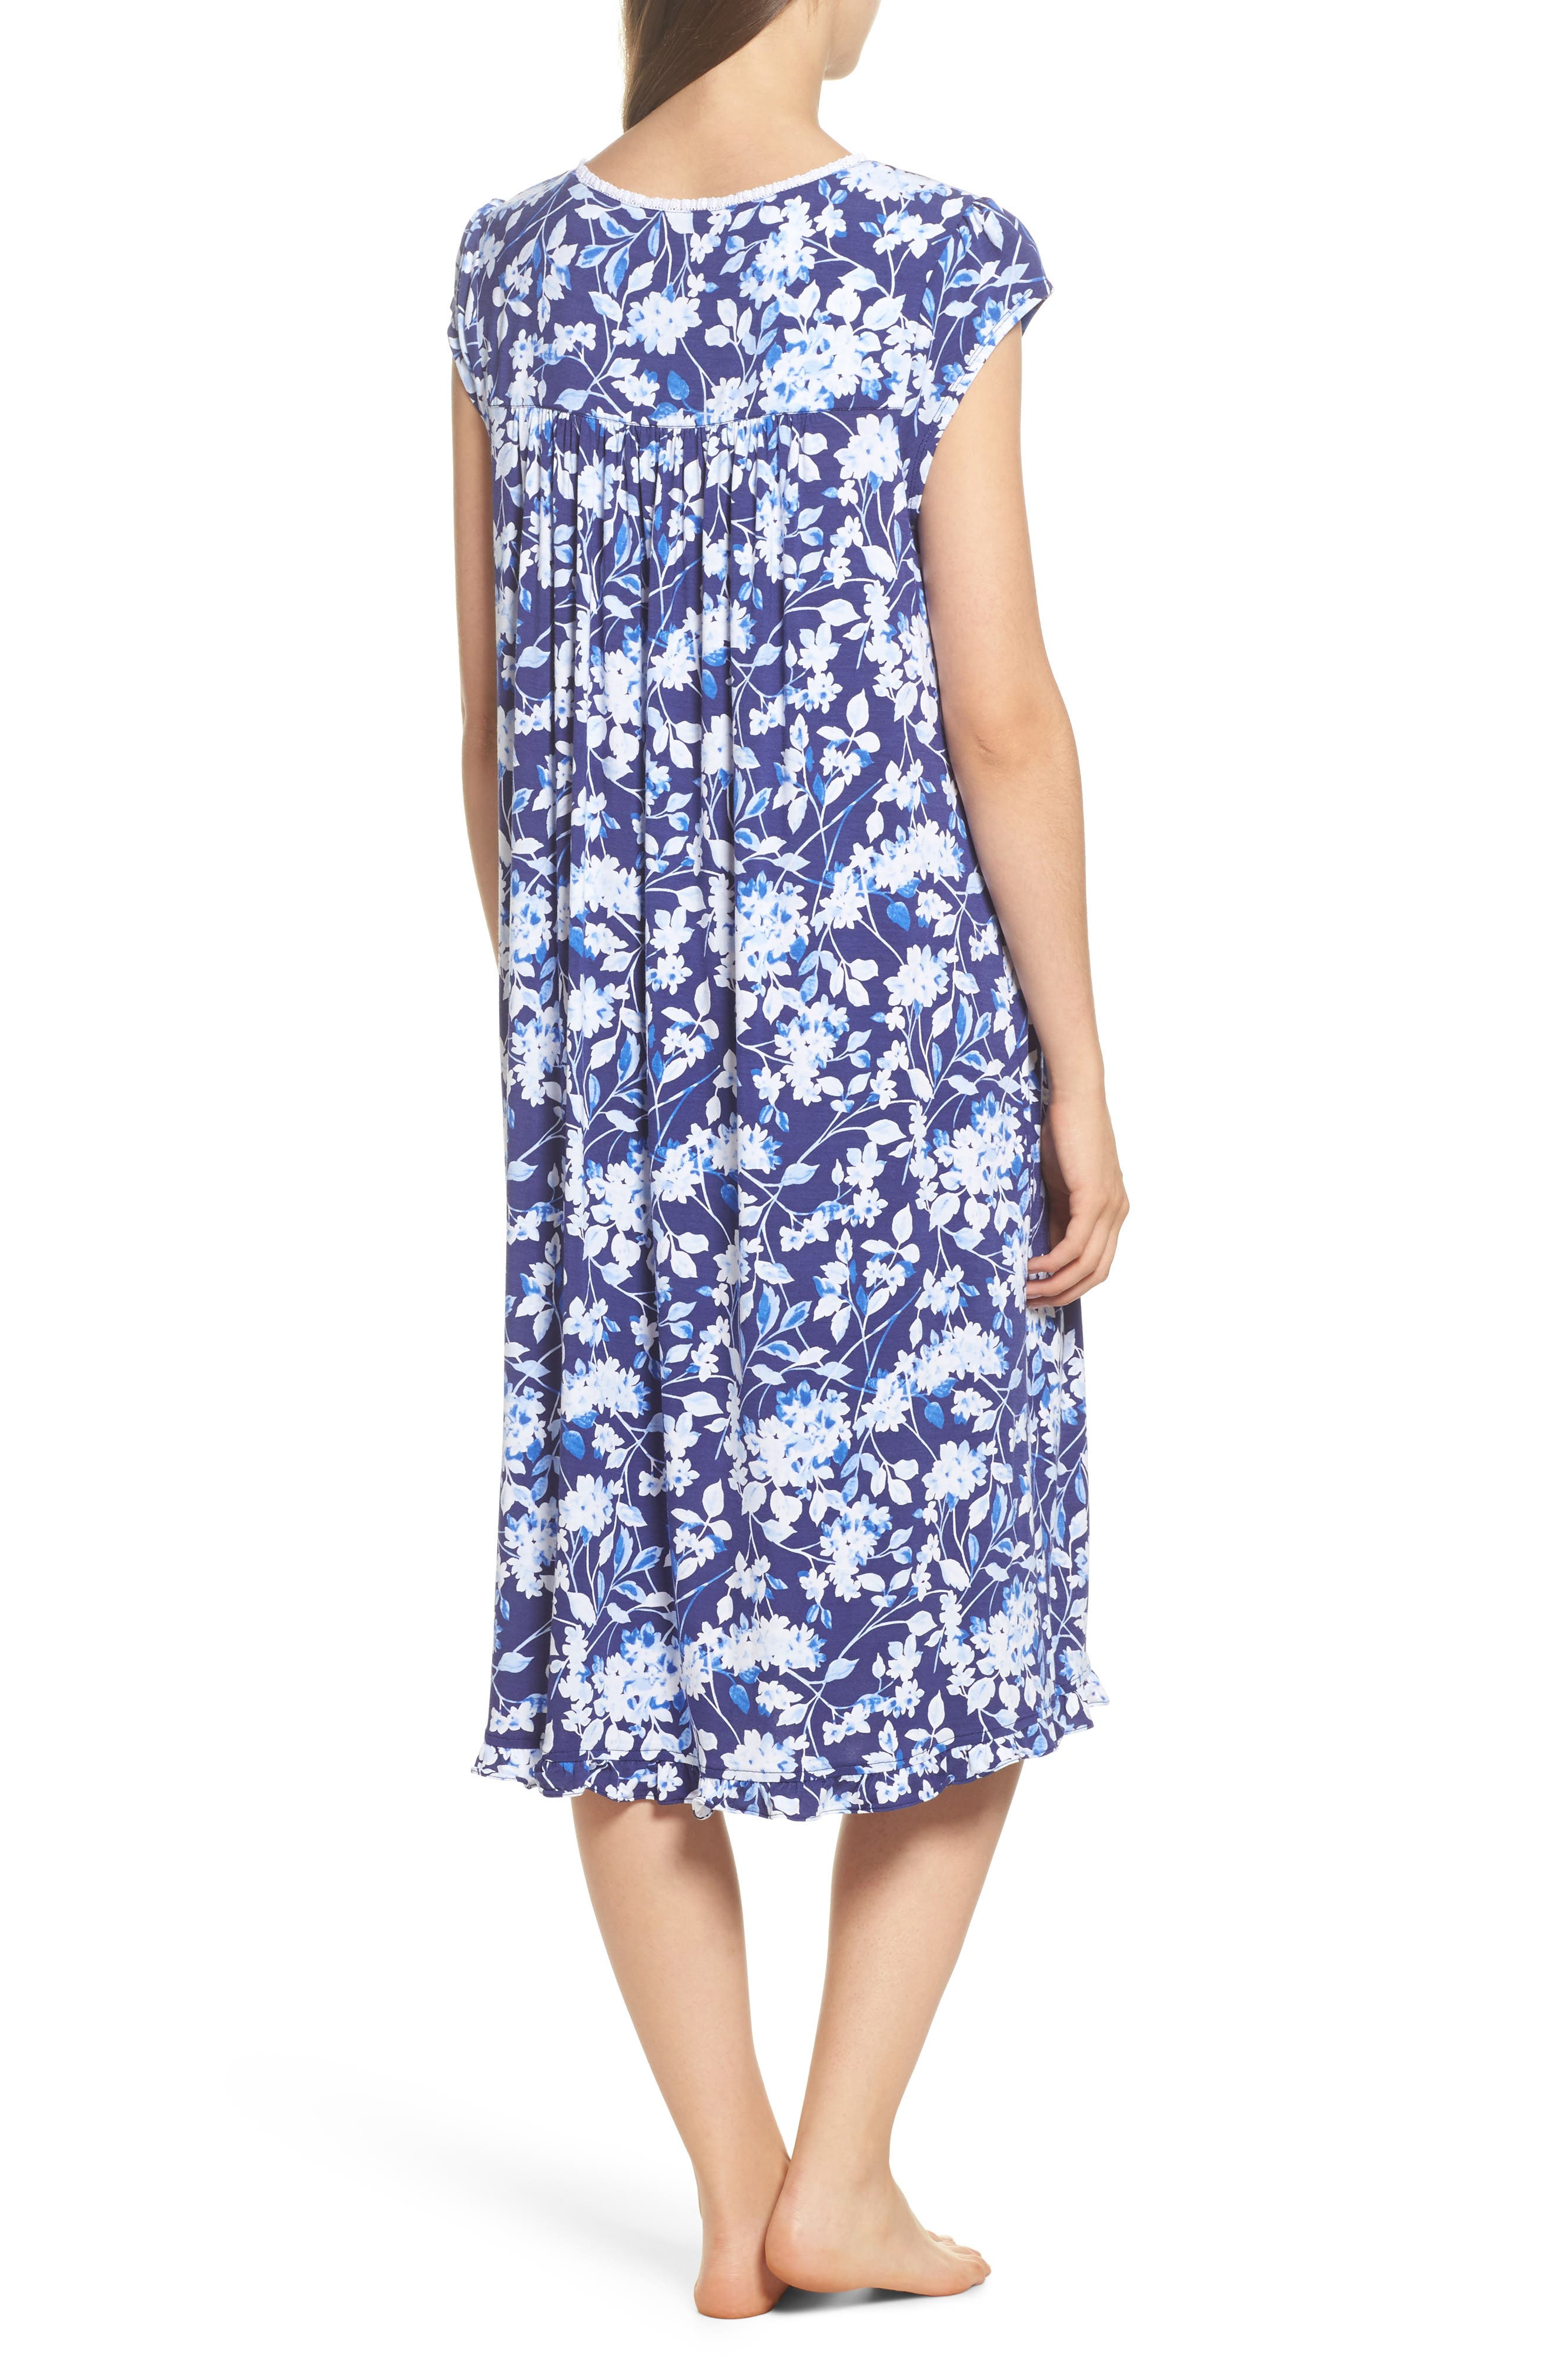 Waltz Nightgown,                             Alternate thumbnail 2, color,                             Blue Multi Floral